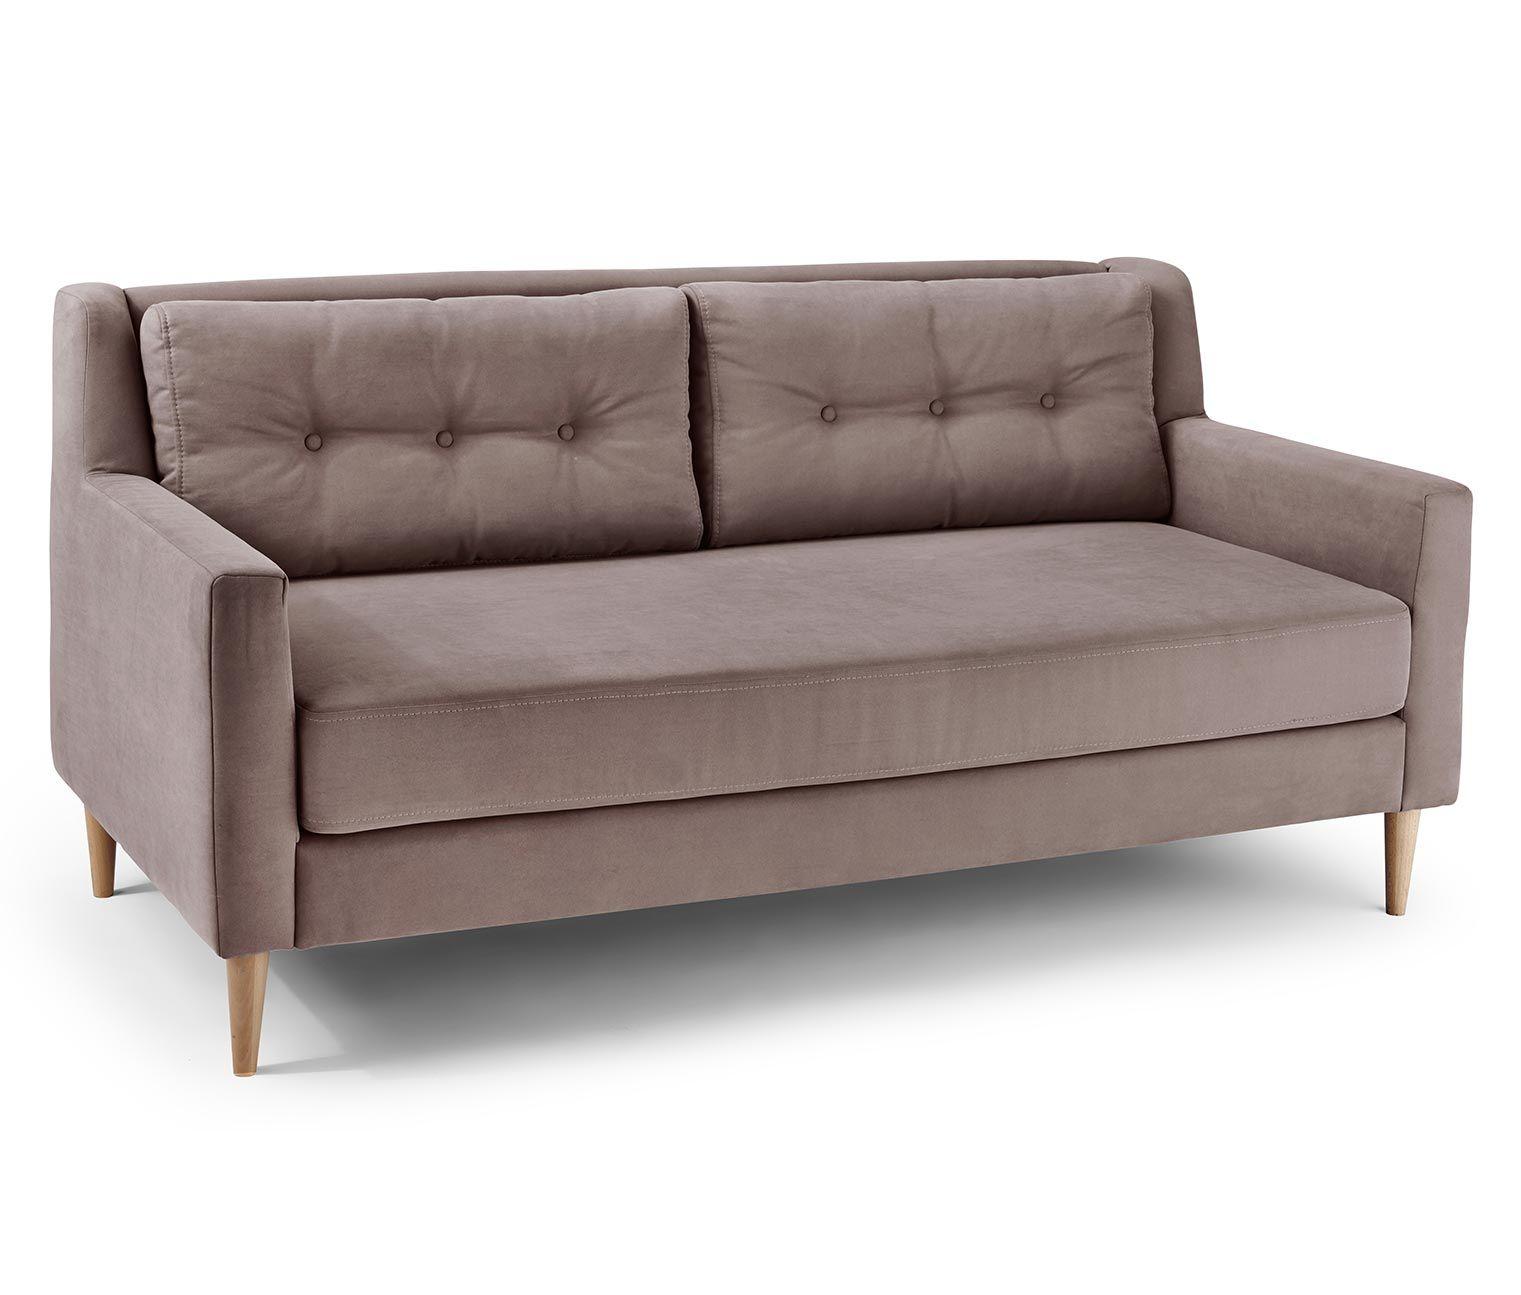 Tchibo Sofa sofa 316069 w tchibo sofa jak ta lala living room